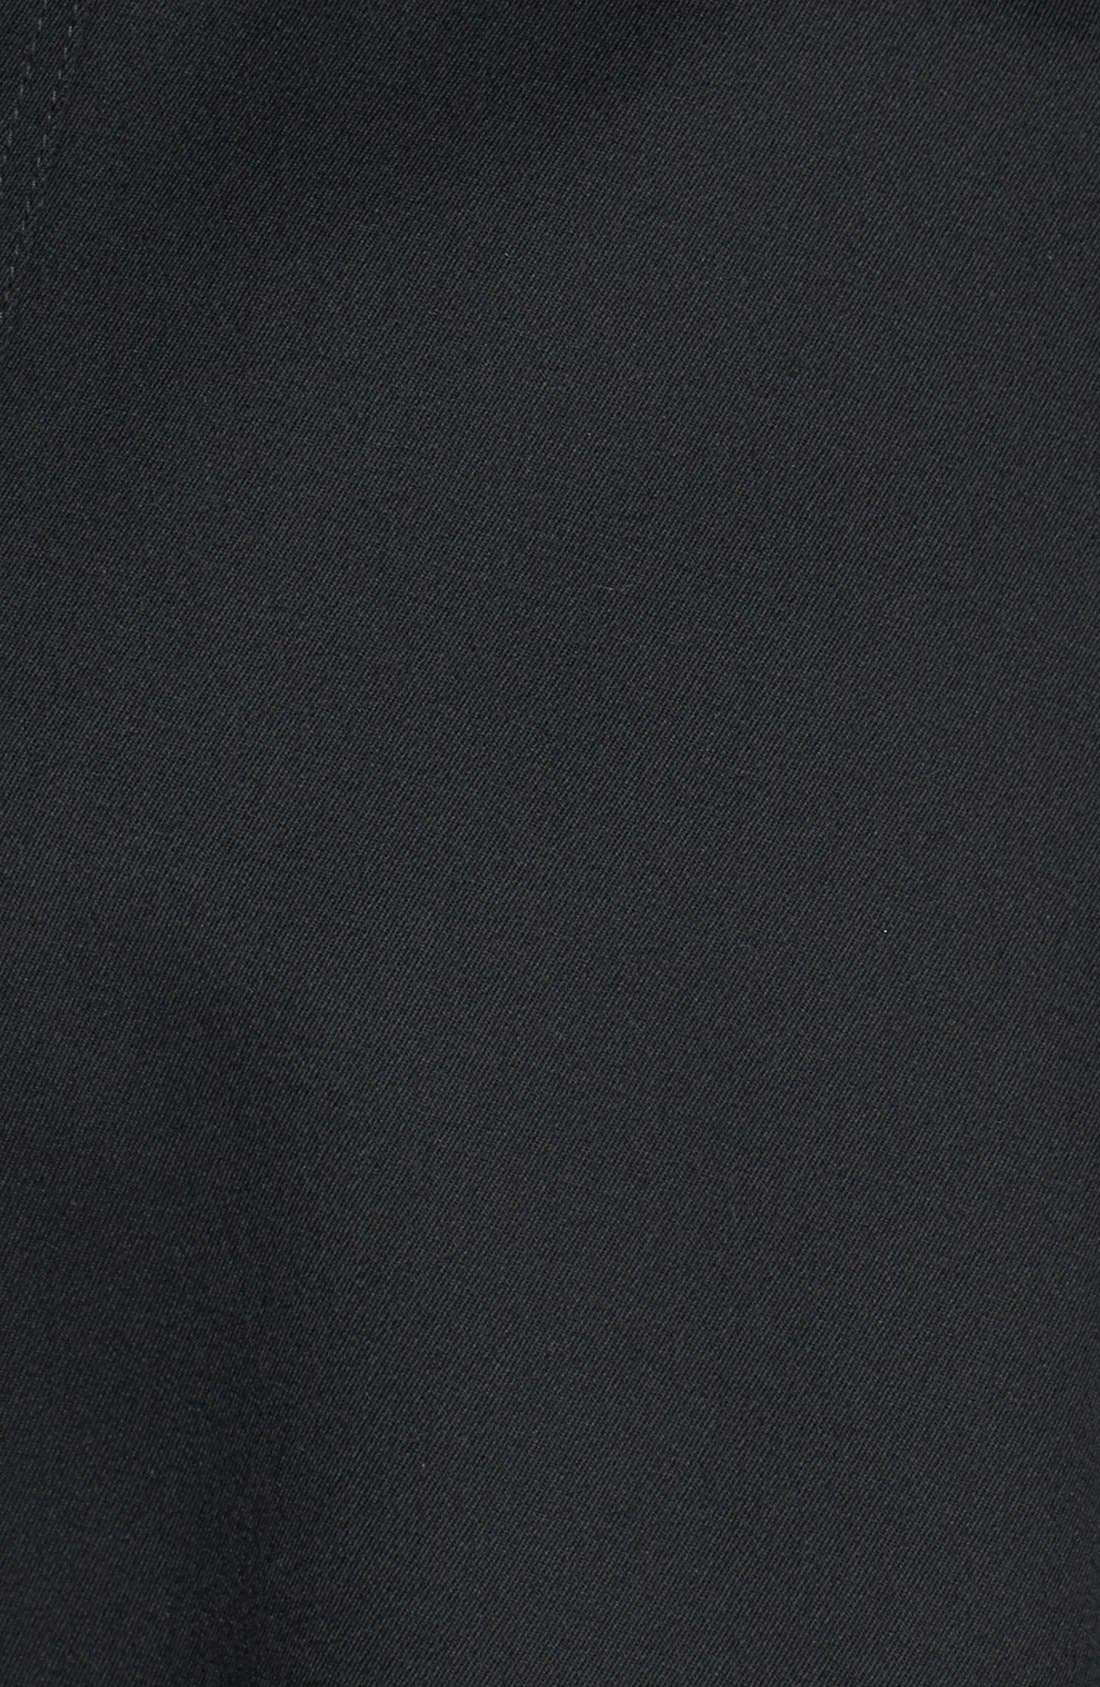 Alternate Image 3  - Trina Turk 'Gwyneth' Flared Wool Gabardine Trench Coat (Regular & Petite)